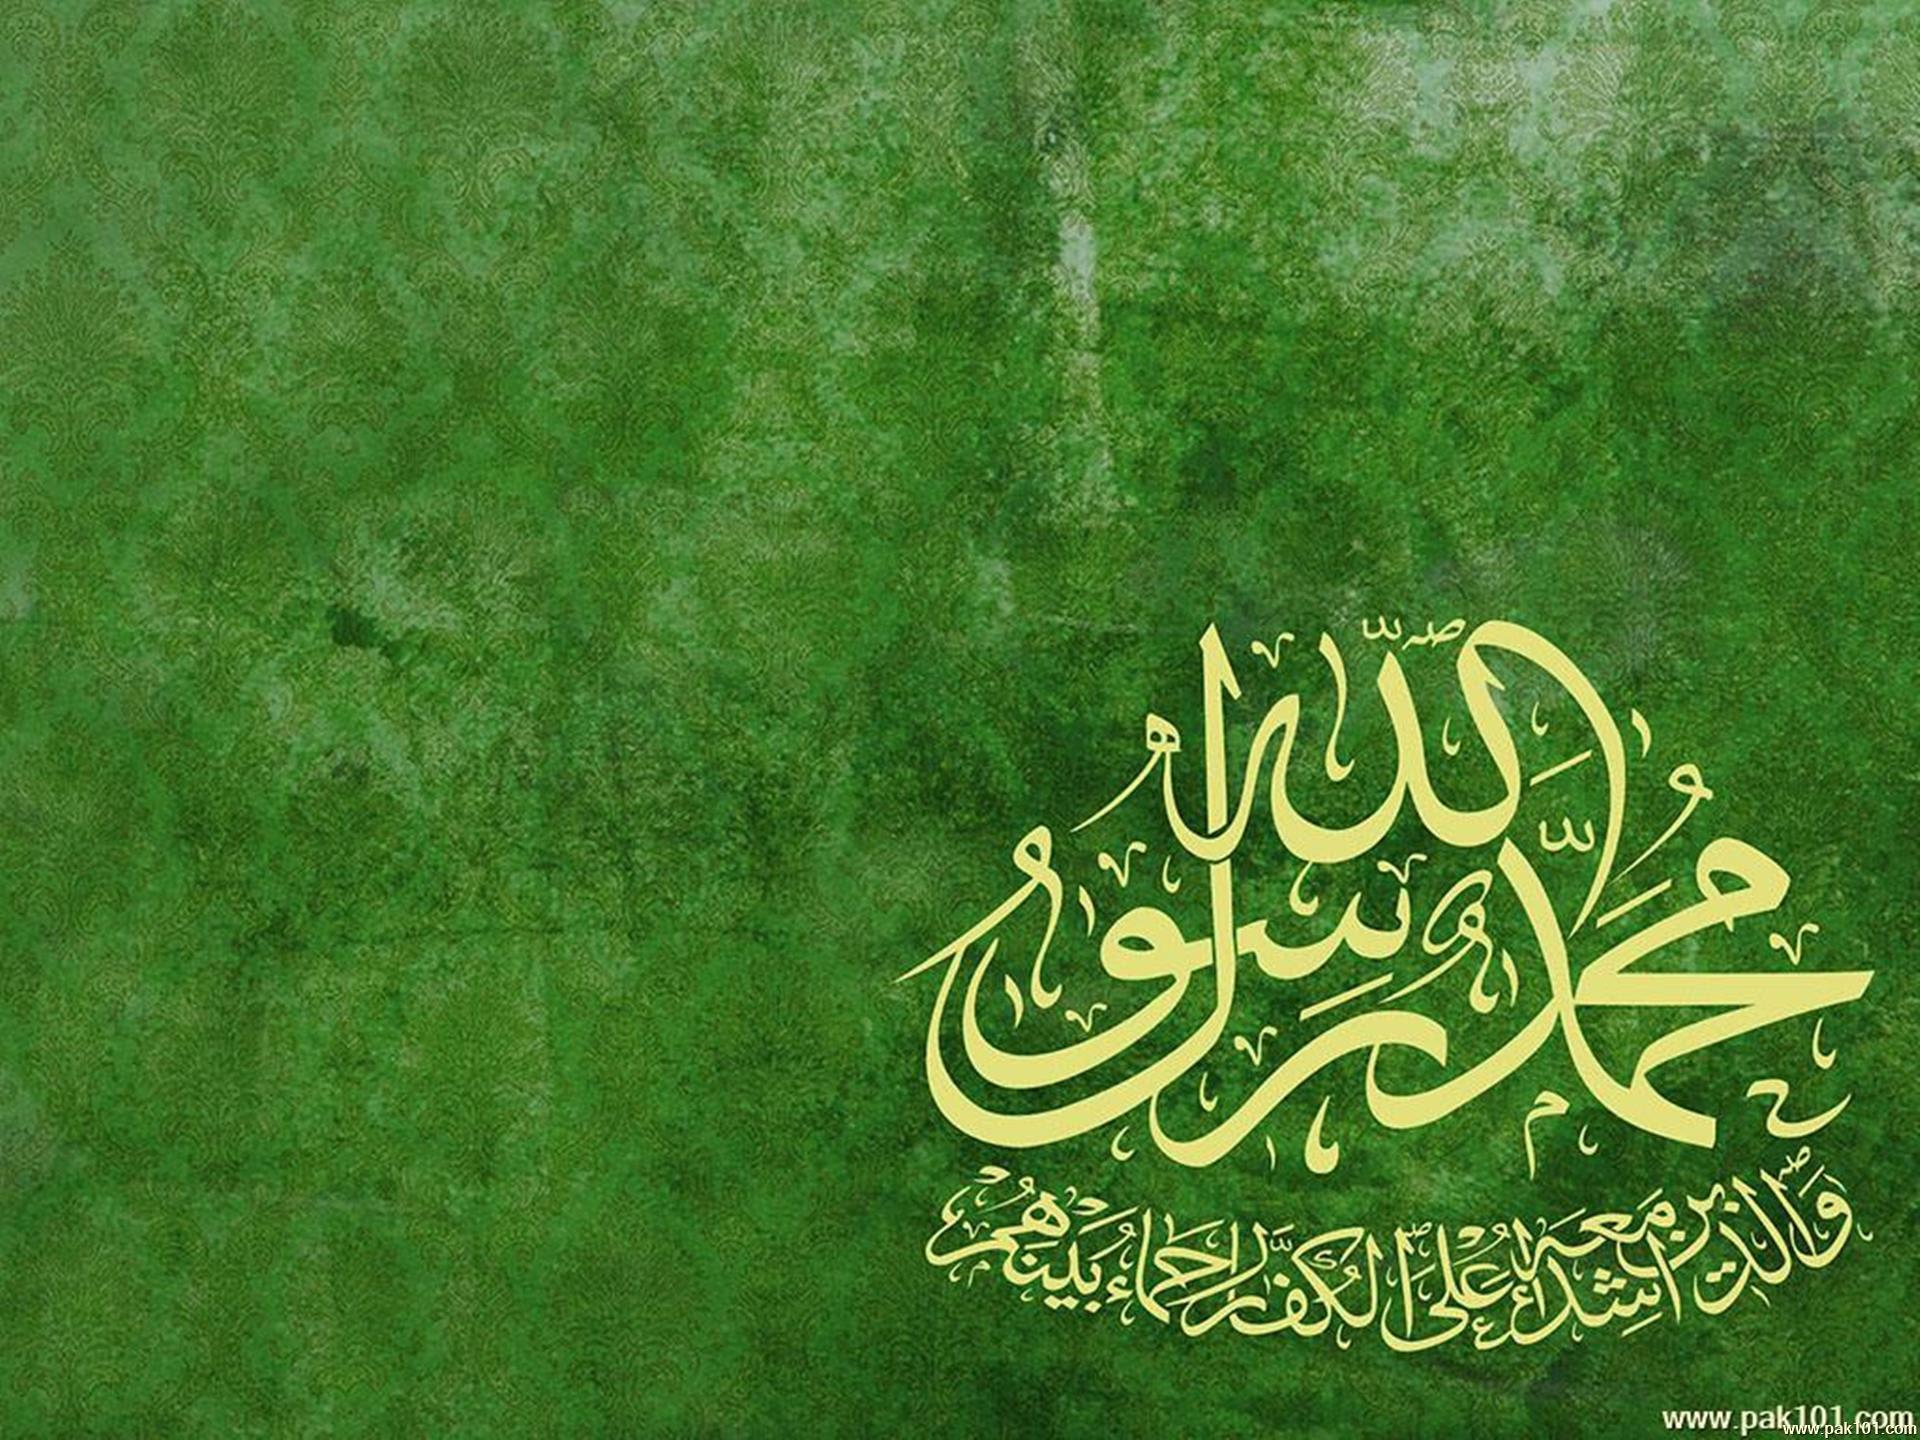 Full Wallpaper Hd Wallpaper Hd Kaligrafi Muhammad